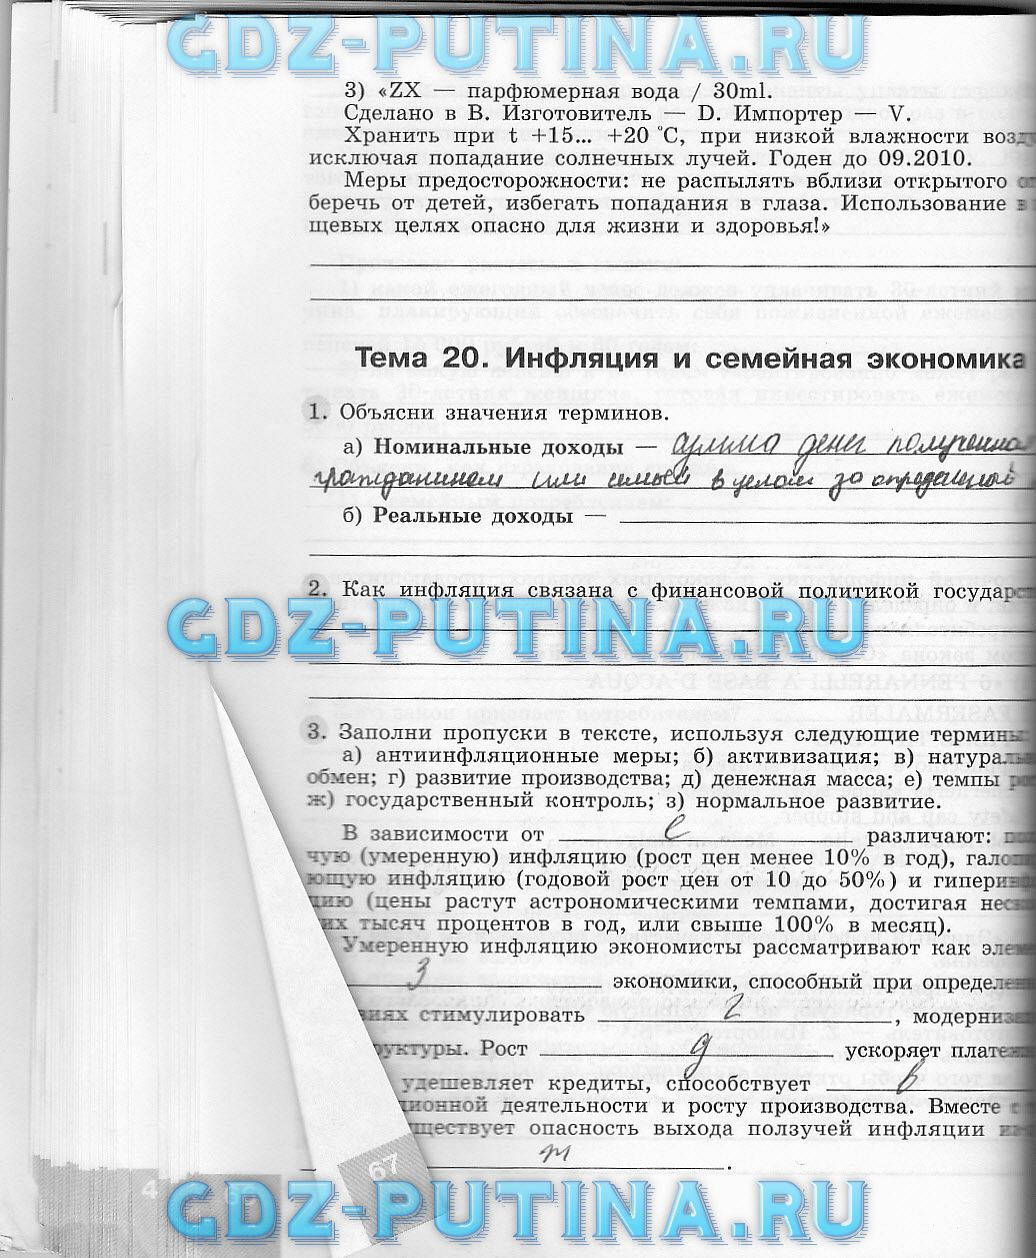 Гдз По Обществознанию 8 Класс Рабочая Тетрадь Котова Лискова Гдз От Путина